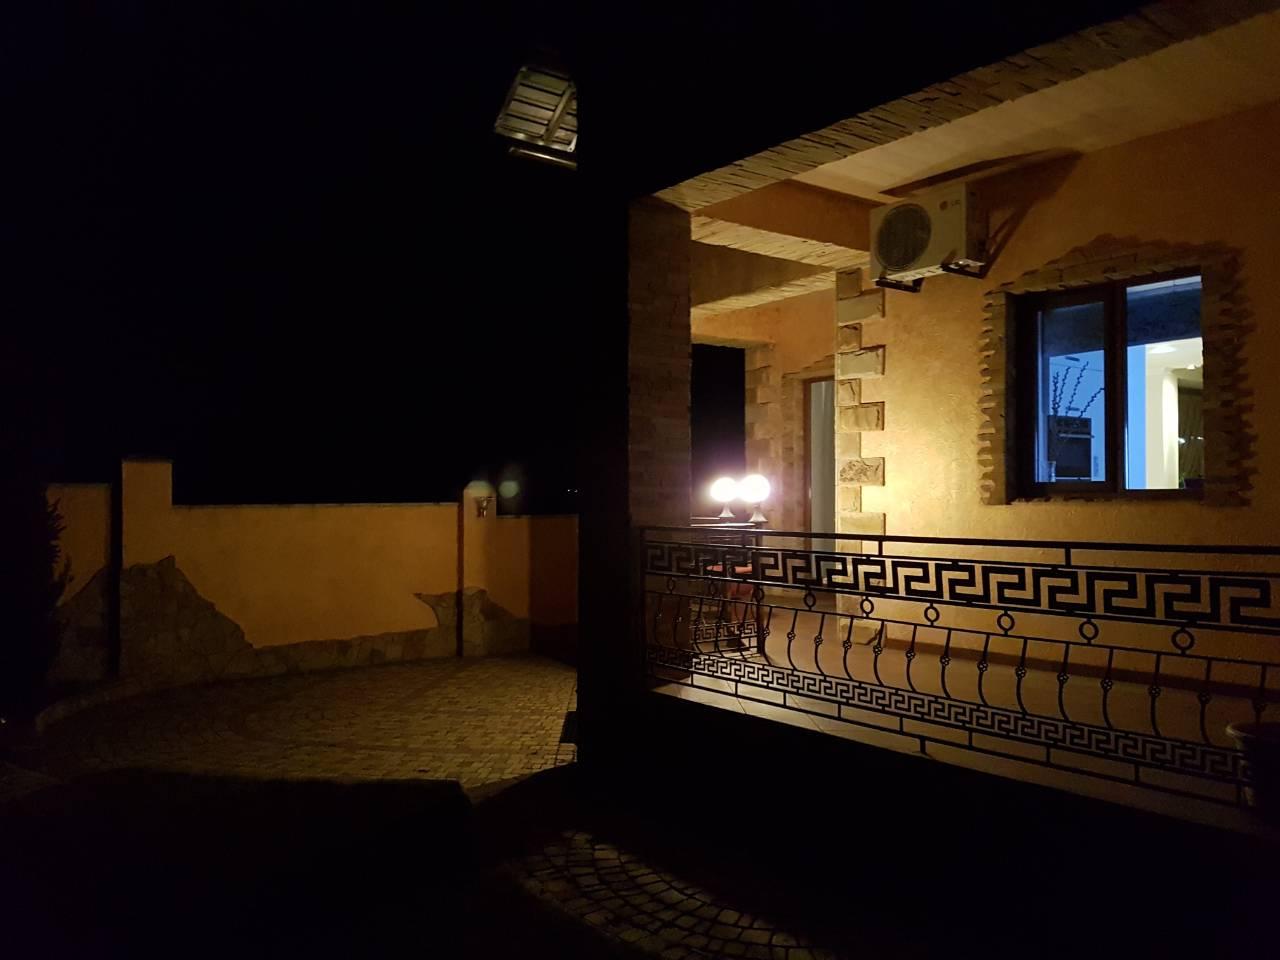 Продается Дом на ул. Ивана Липы (Калинина) — 550 000 у.е. (фото №17)